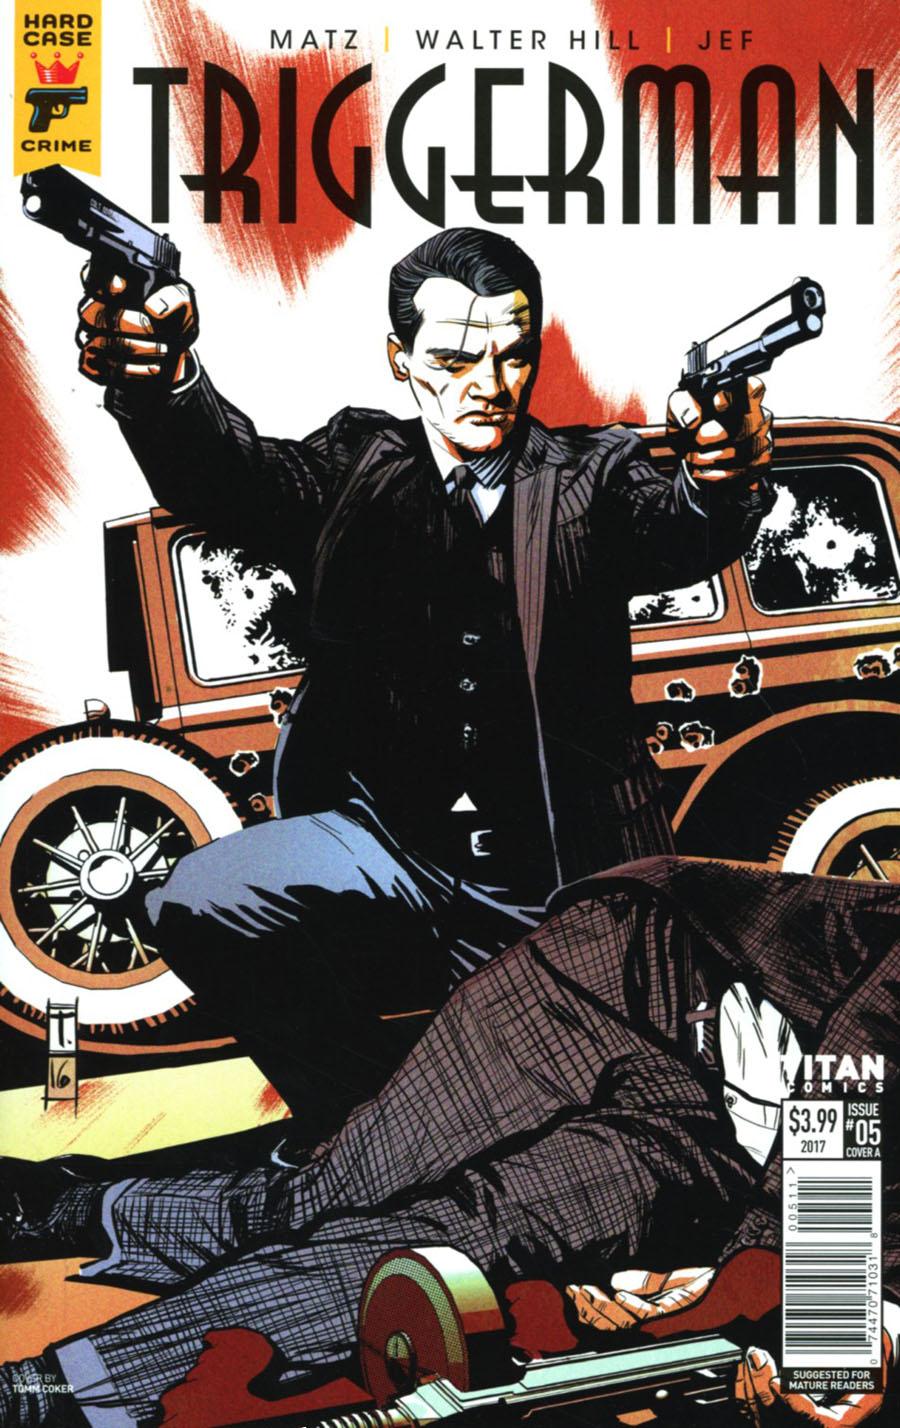 Hard Case Crime Triggerman #5 Cover A Regular Tomm Coker Cover